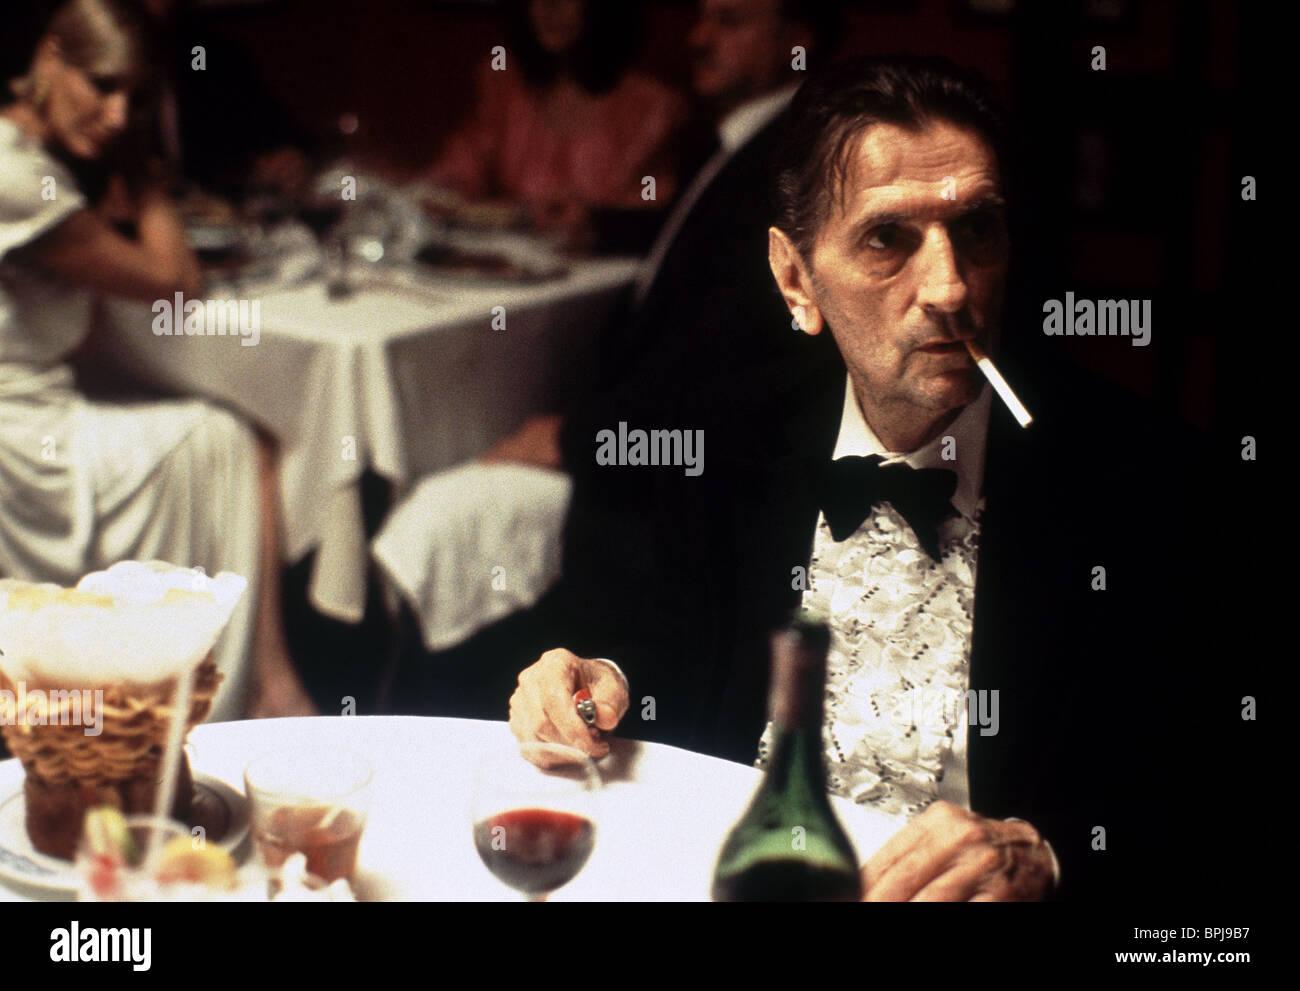 HARRY DEAN STANTON SONNY (2002) - Stock Image